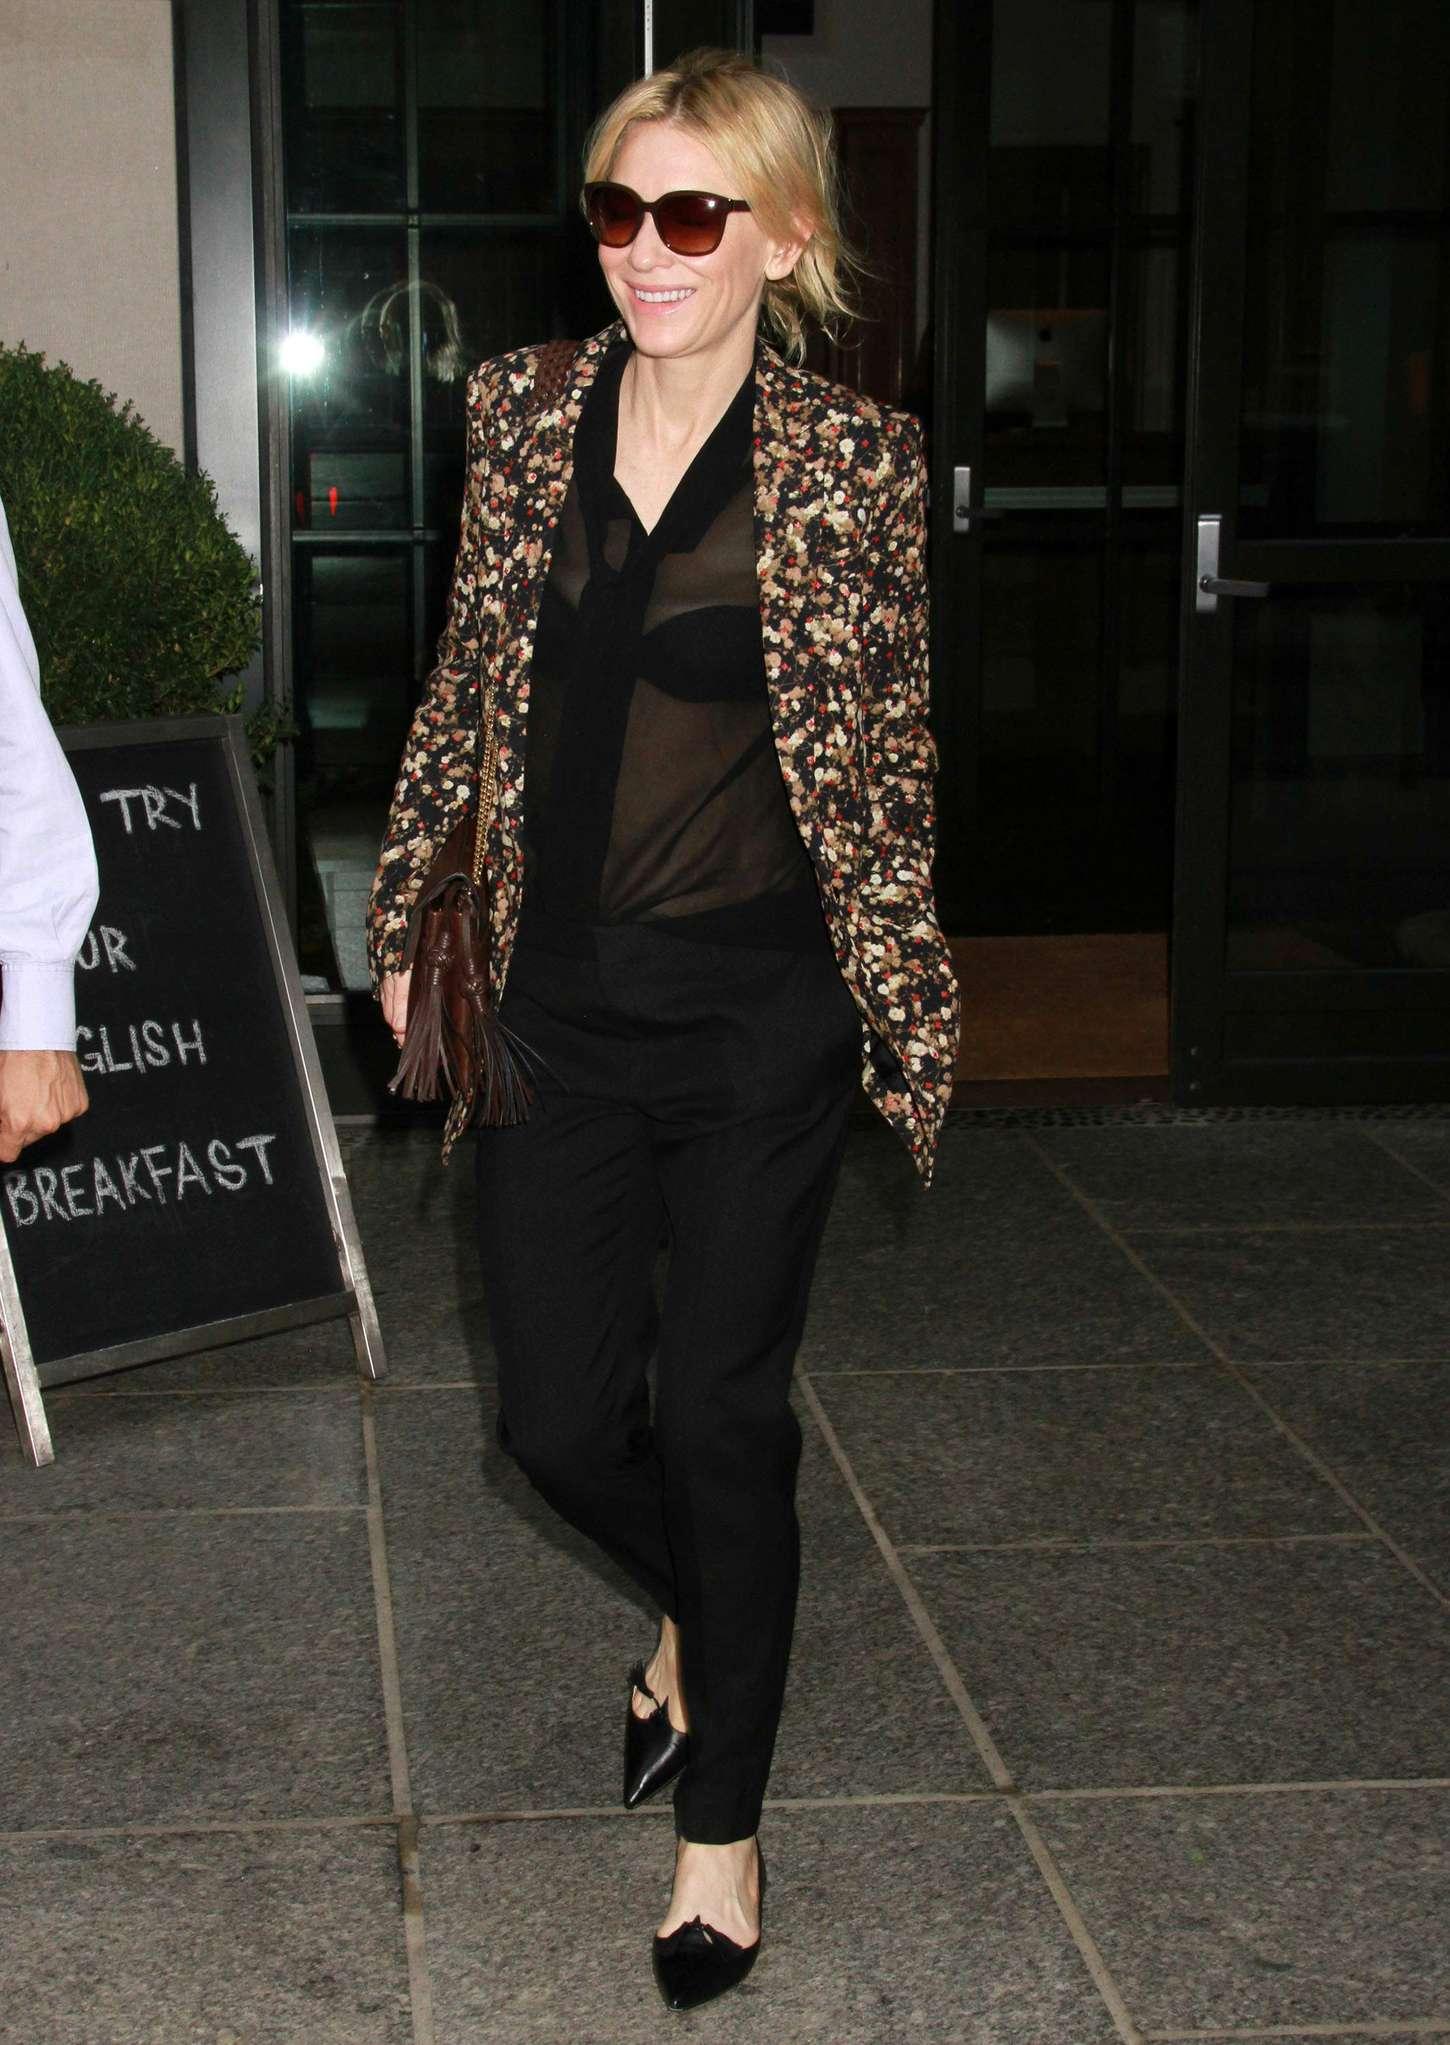 Cate Blanchett 2015 : Cate Blanchett out in New York City -09